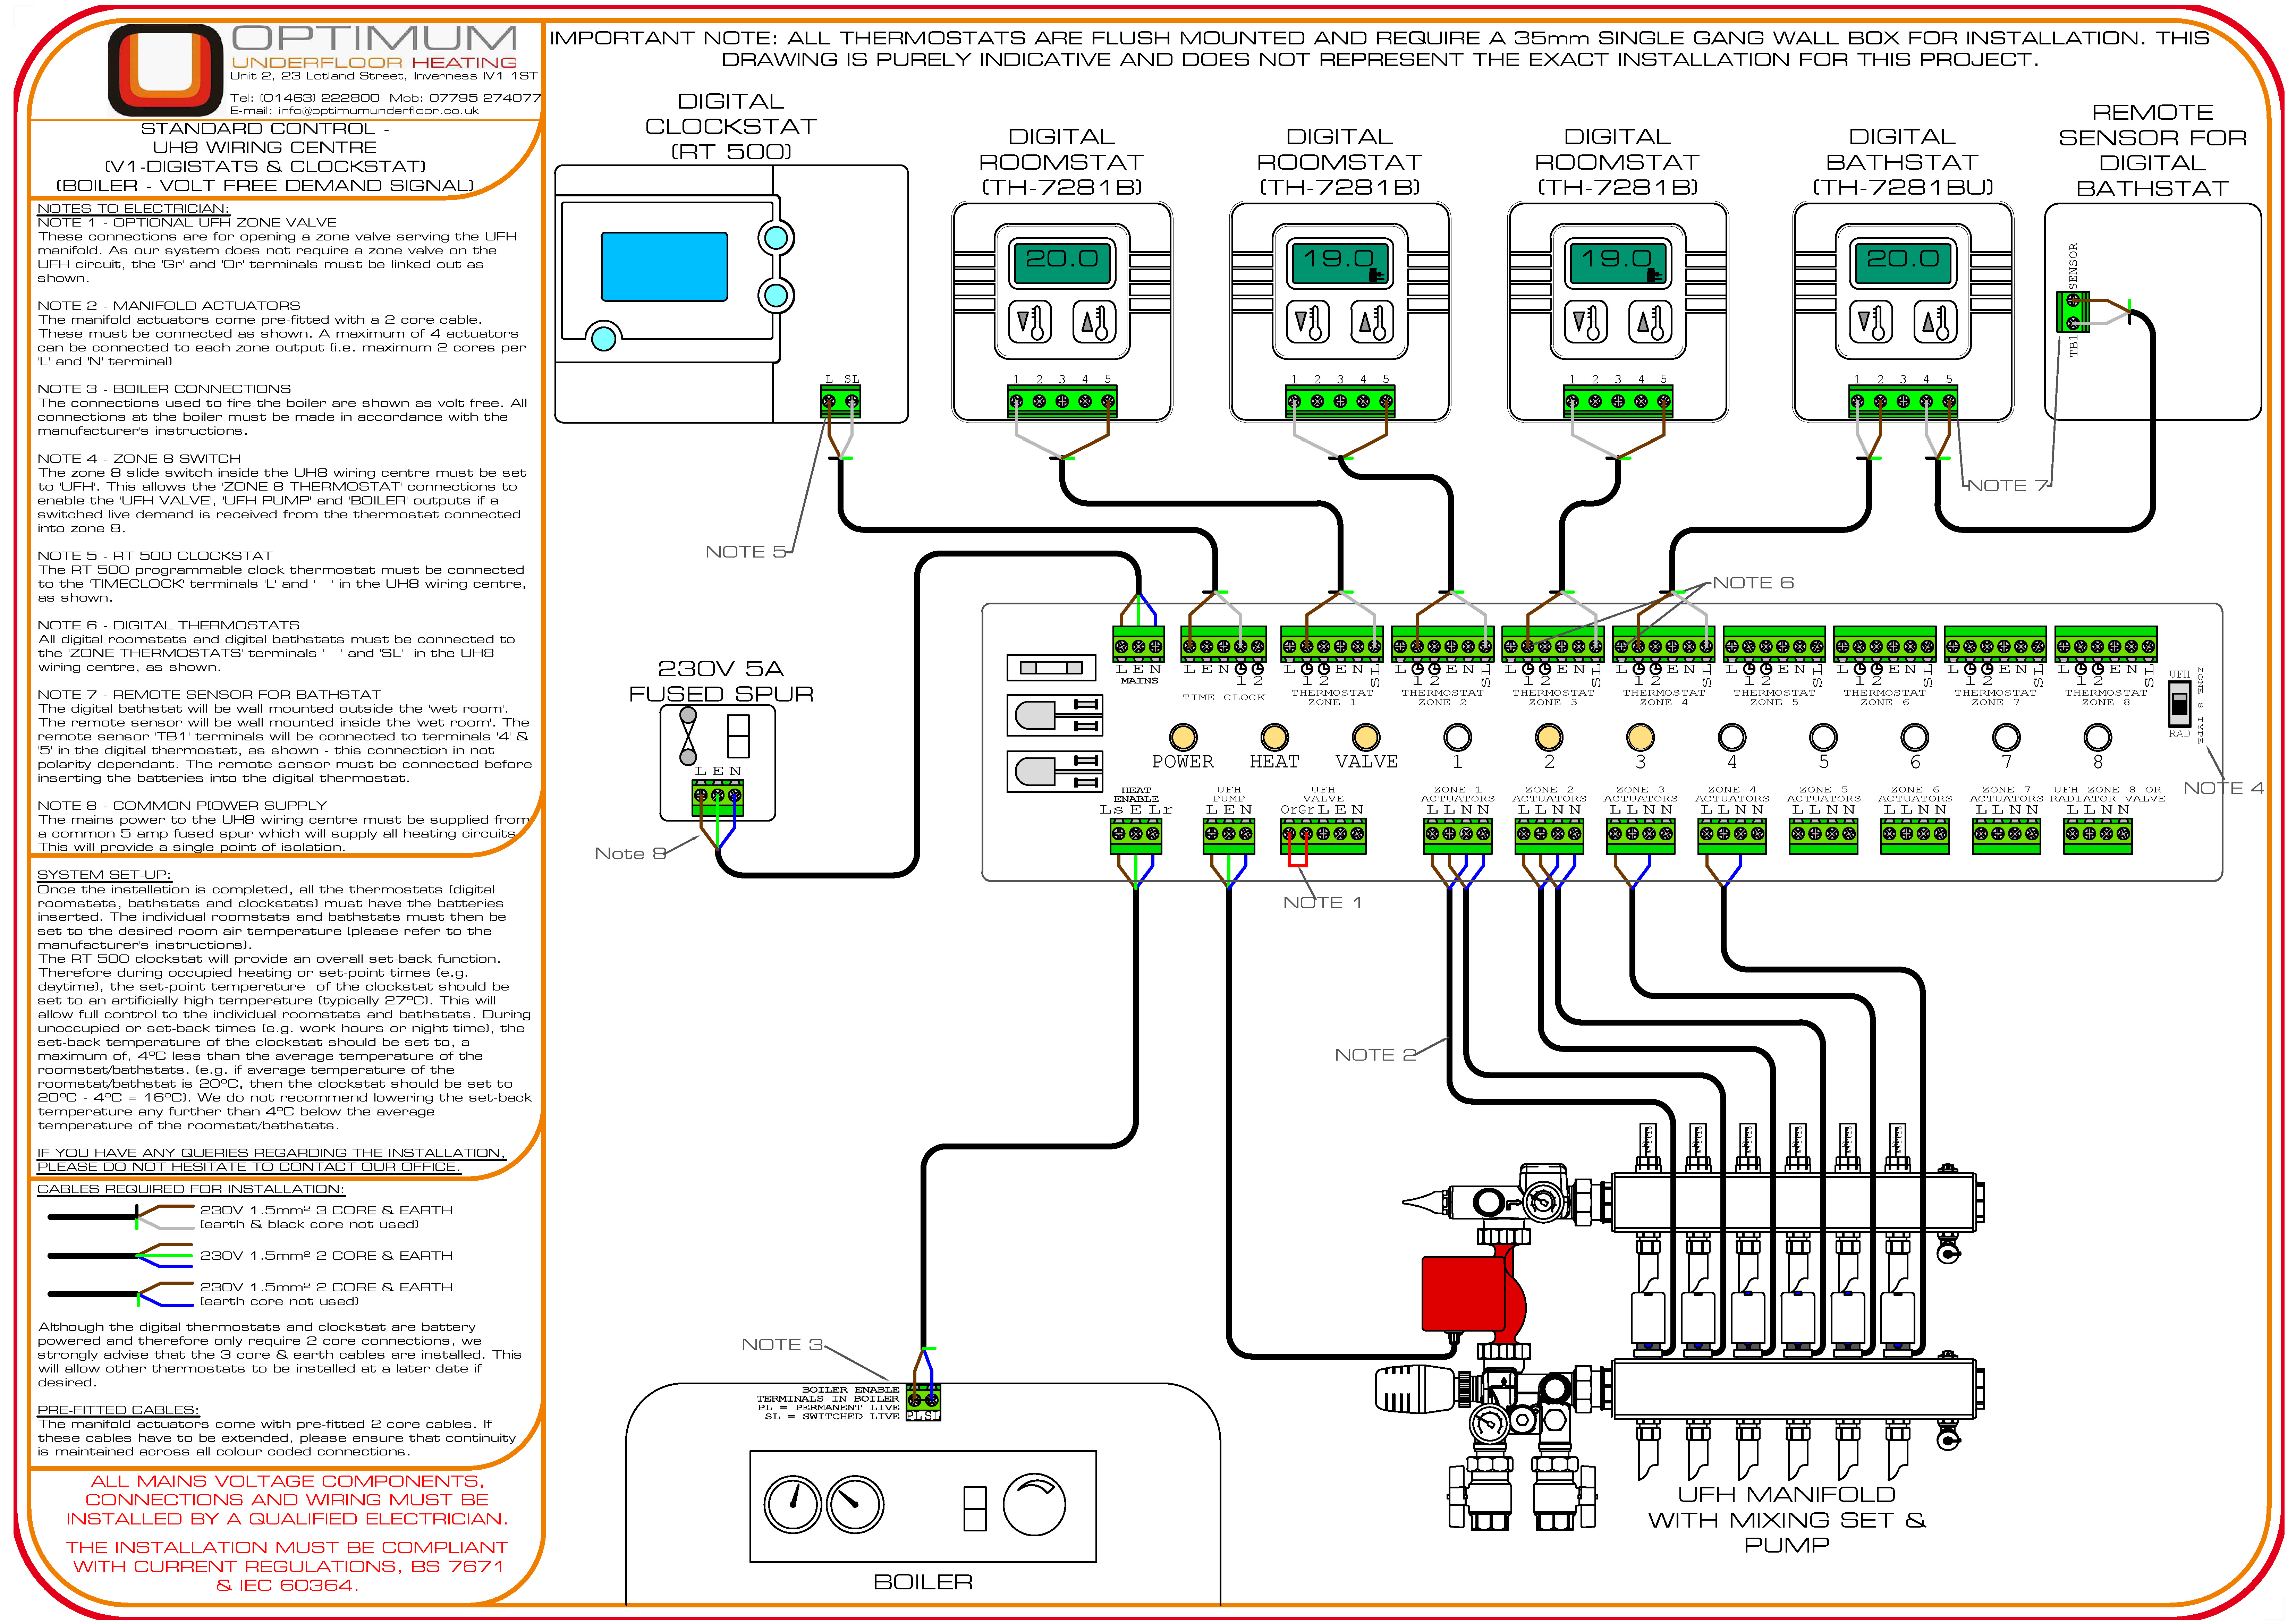 S Plan Wiring Diagram With Underfloor Heating - 1988 F150 Wiring Diagram -  5pin.honda-accordd.waystar.fr Wiring Diagram Resource